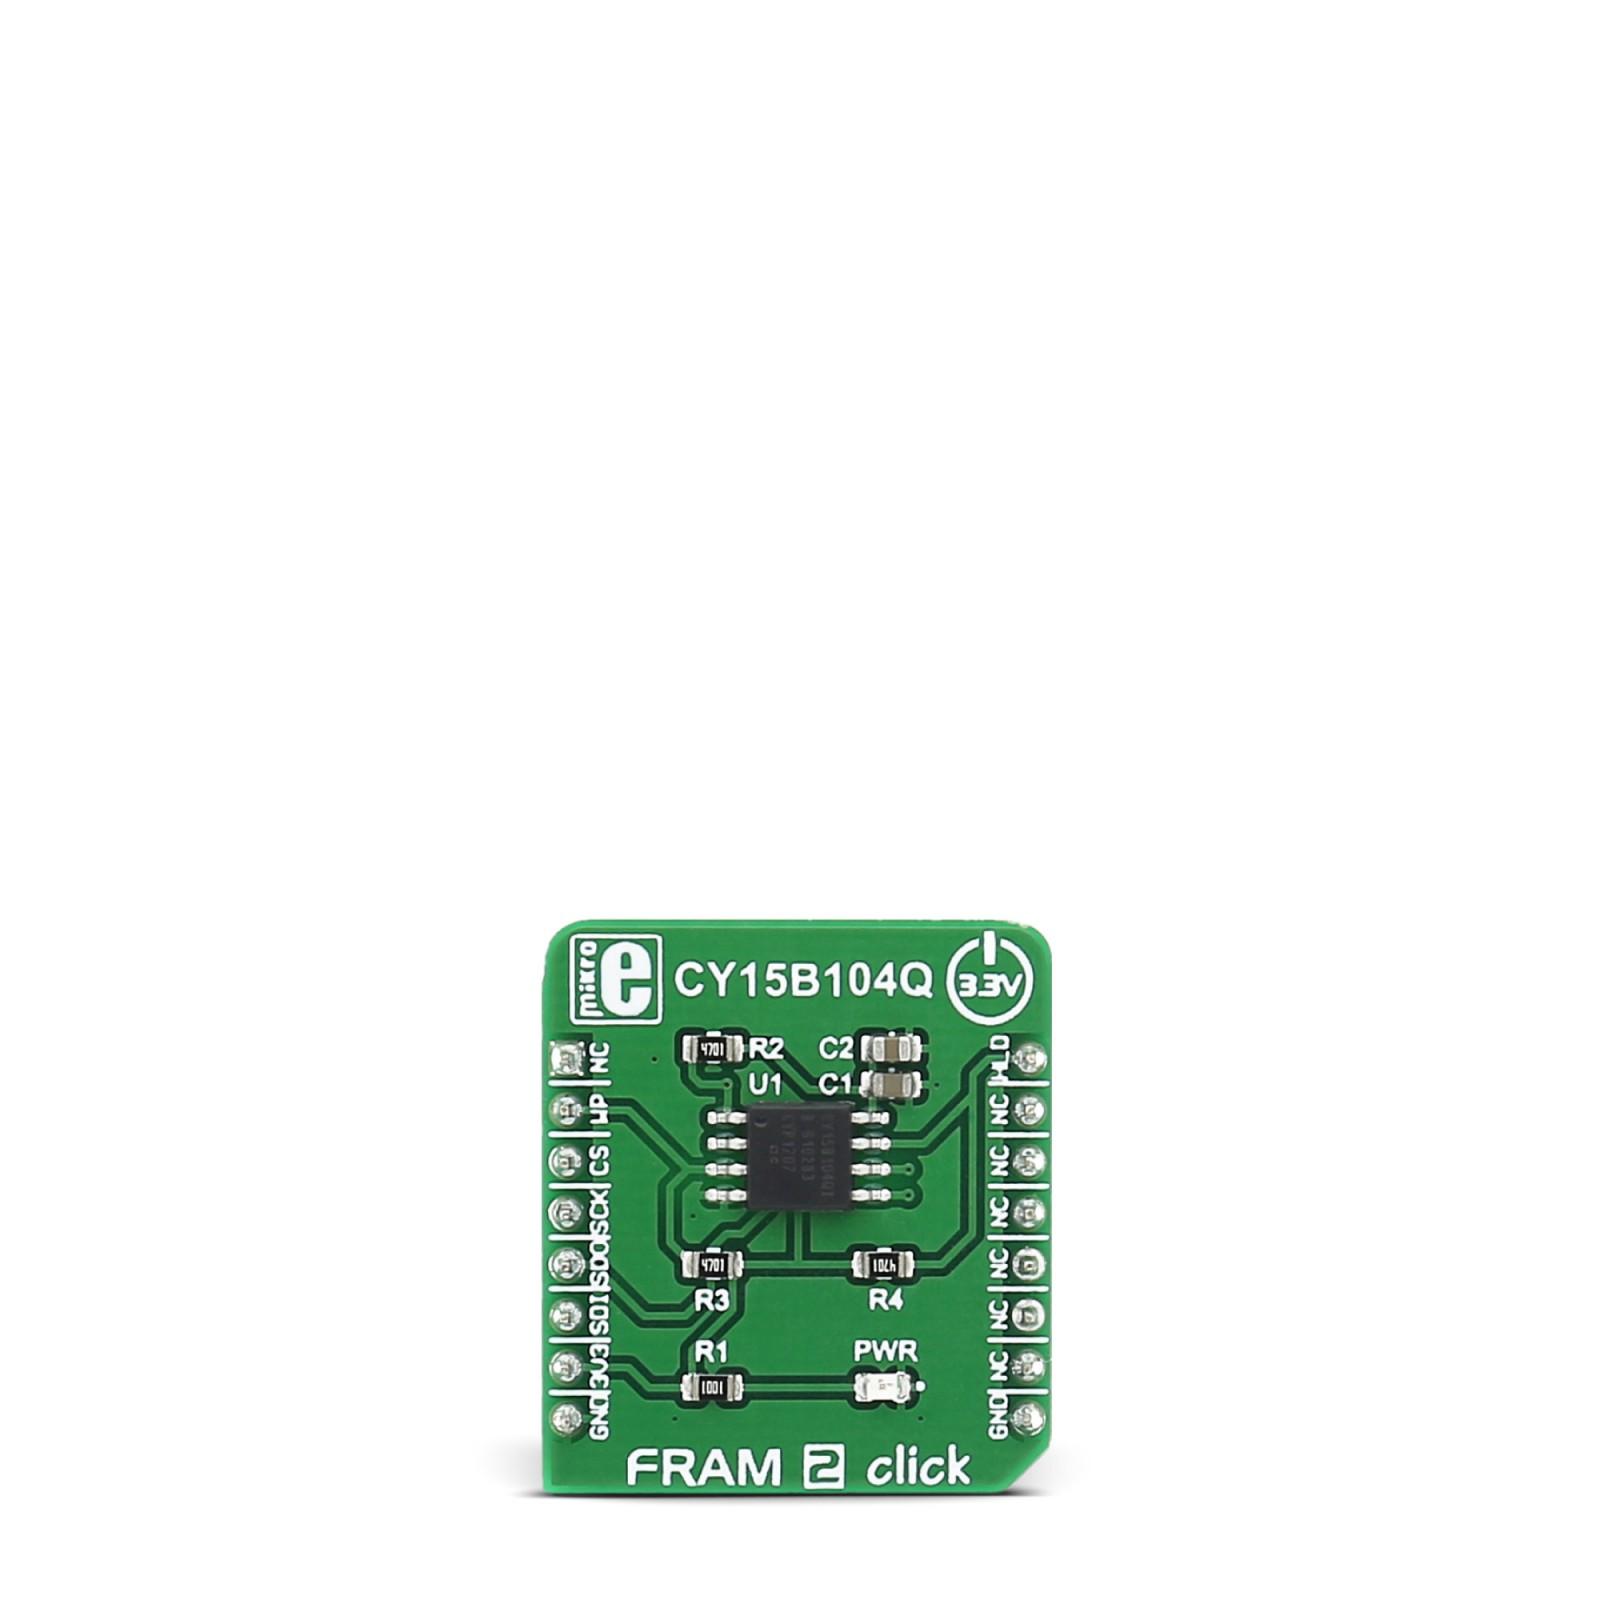 Fram 2 Click Carries The Cy15b104q 4 Mbit 512k X 8 Serial Spi F Copyright Of This Circuit Belongs To Smart Kit Electronics In Mgctlbxnmzp Mgctlbxv5112 Mgctlbxlc Mgctlbxpprestashop